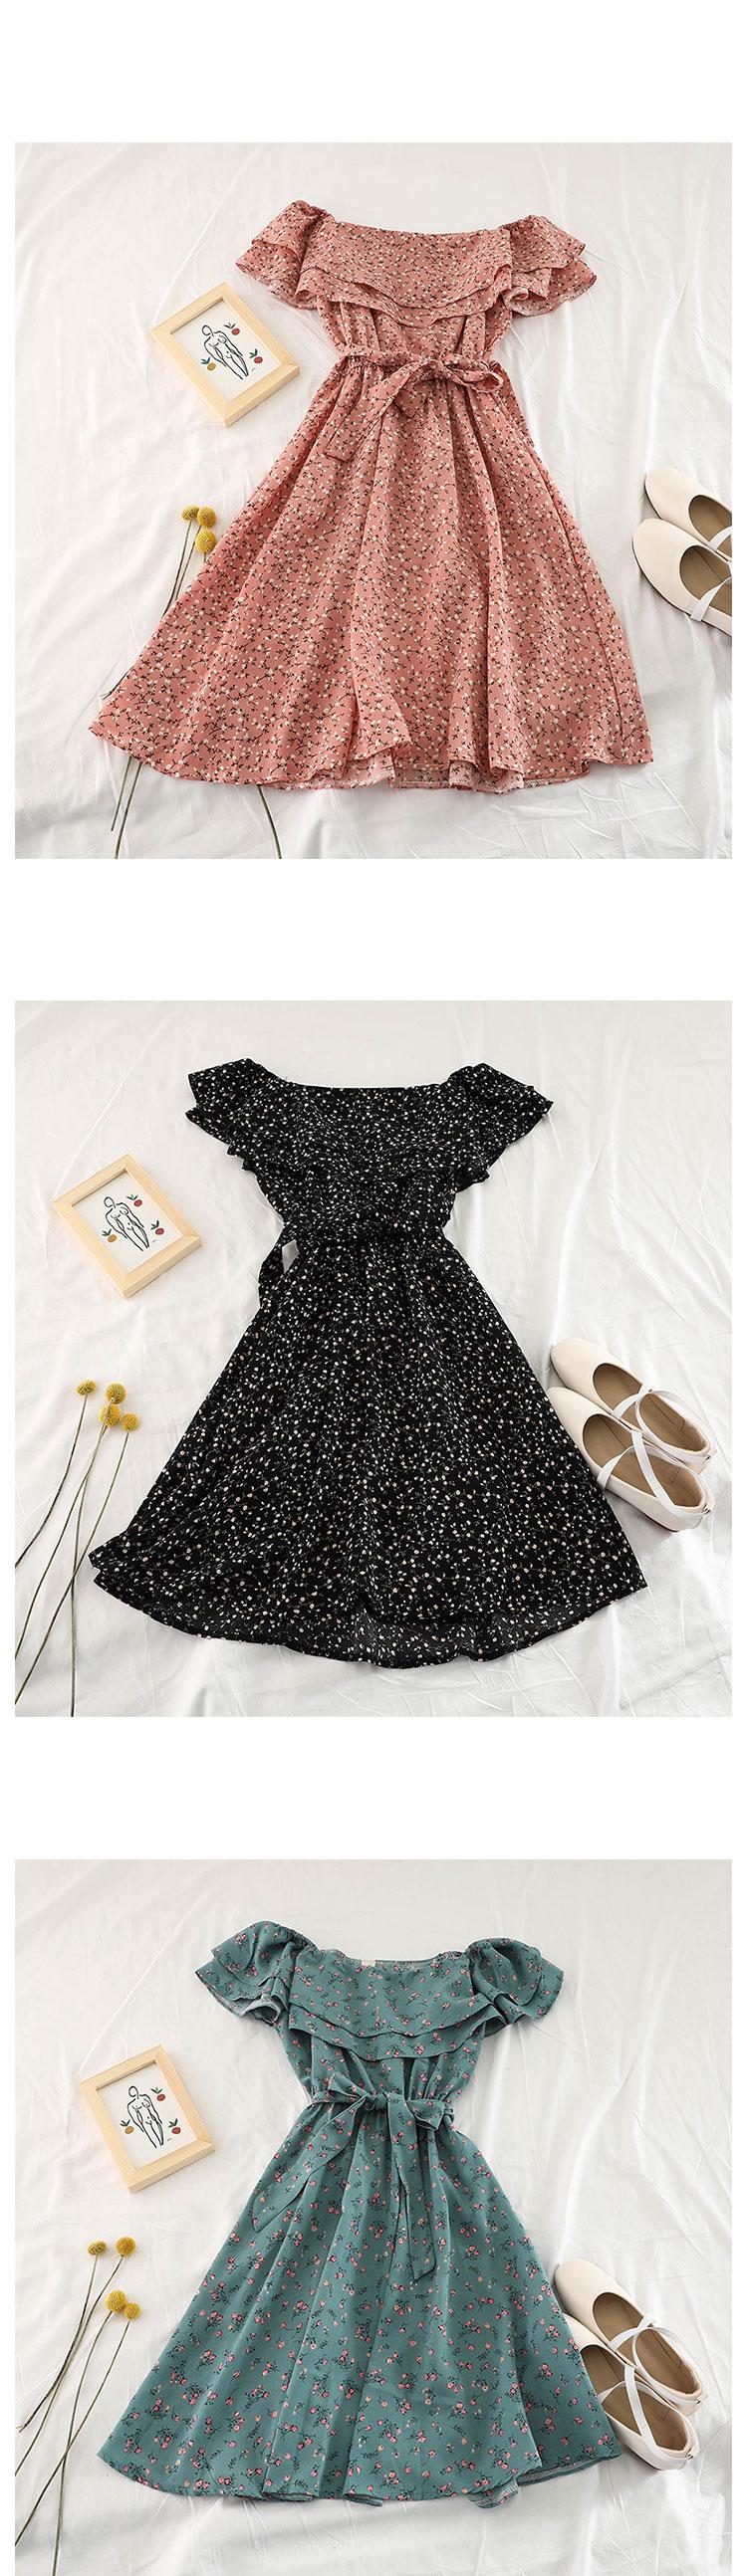 New fashion women's dresses 4